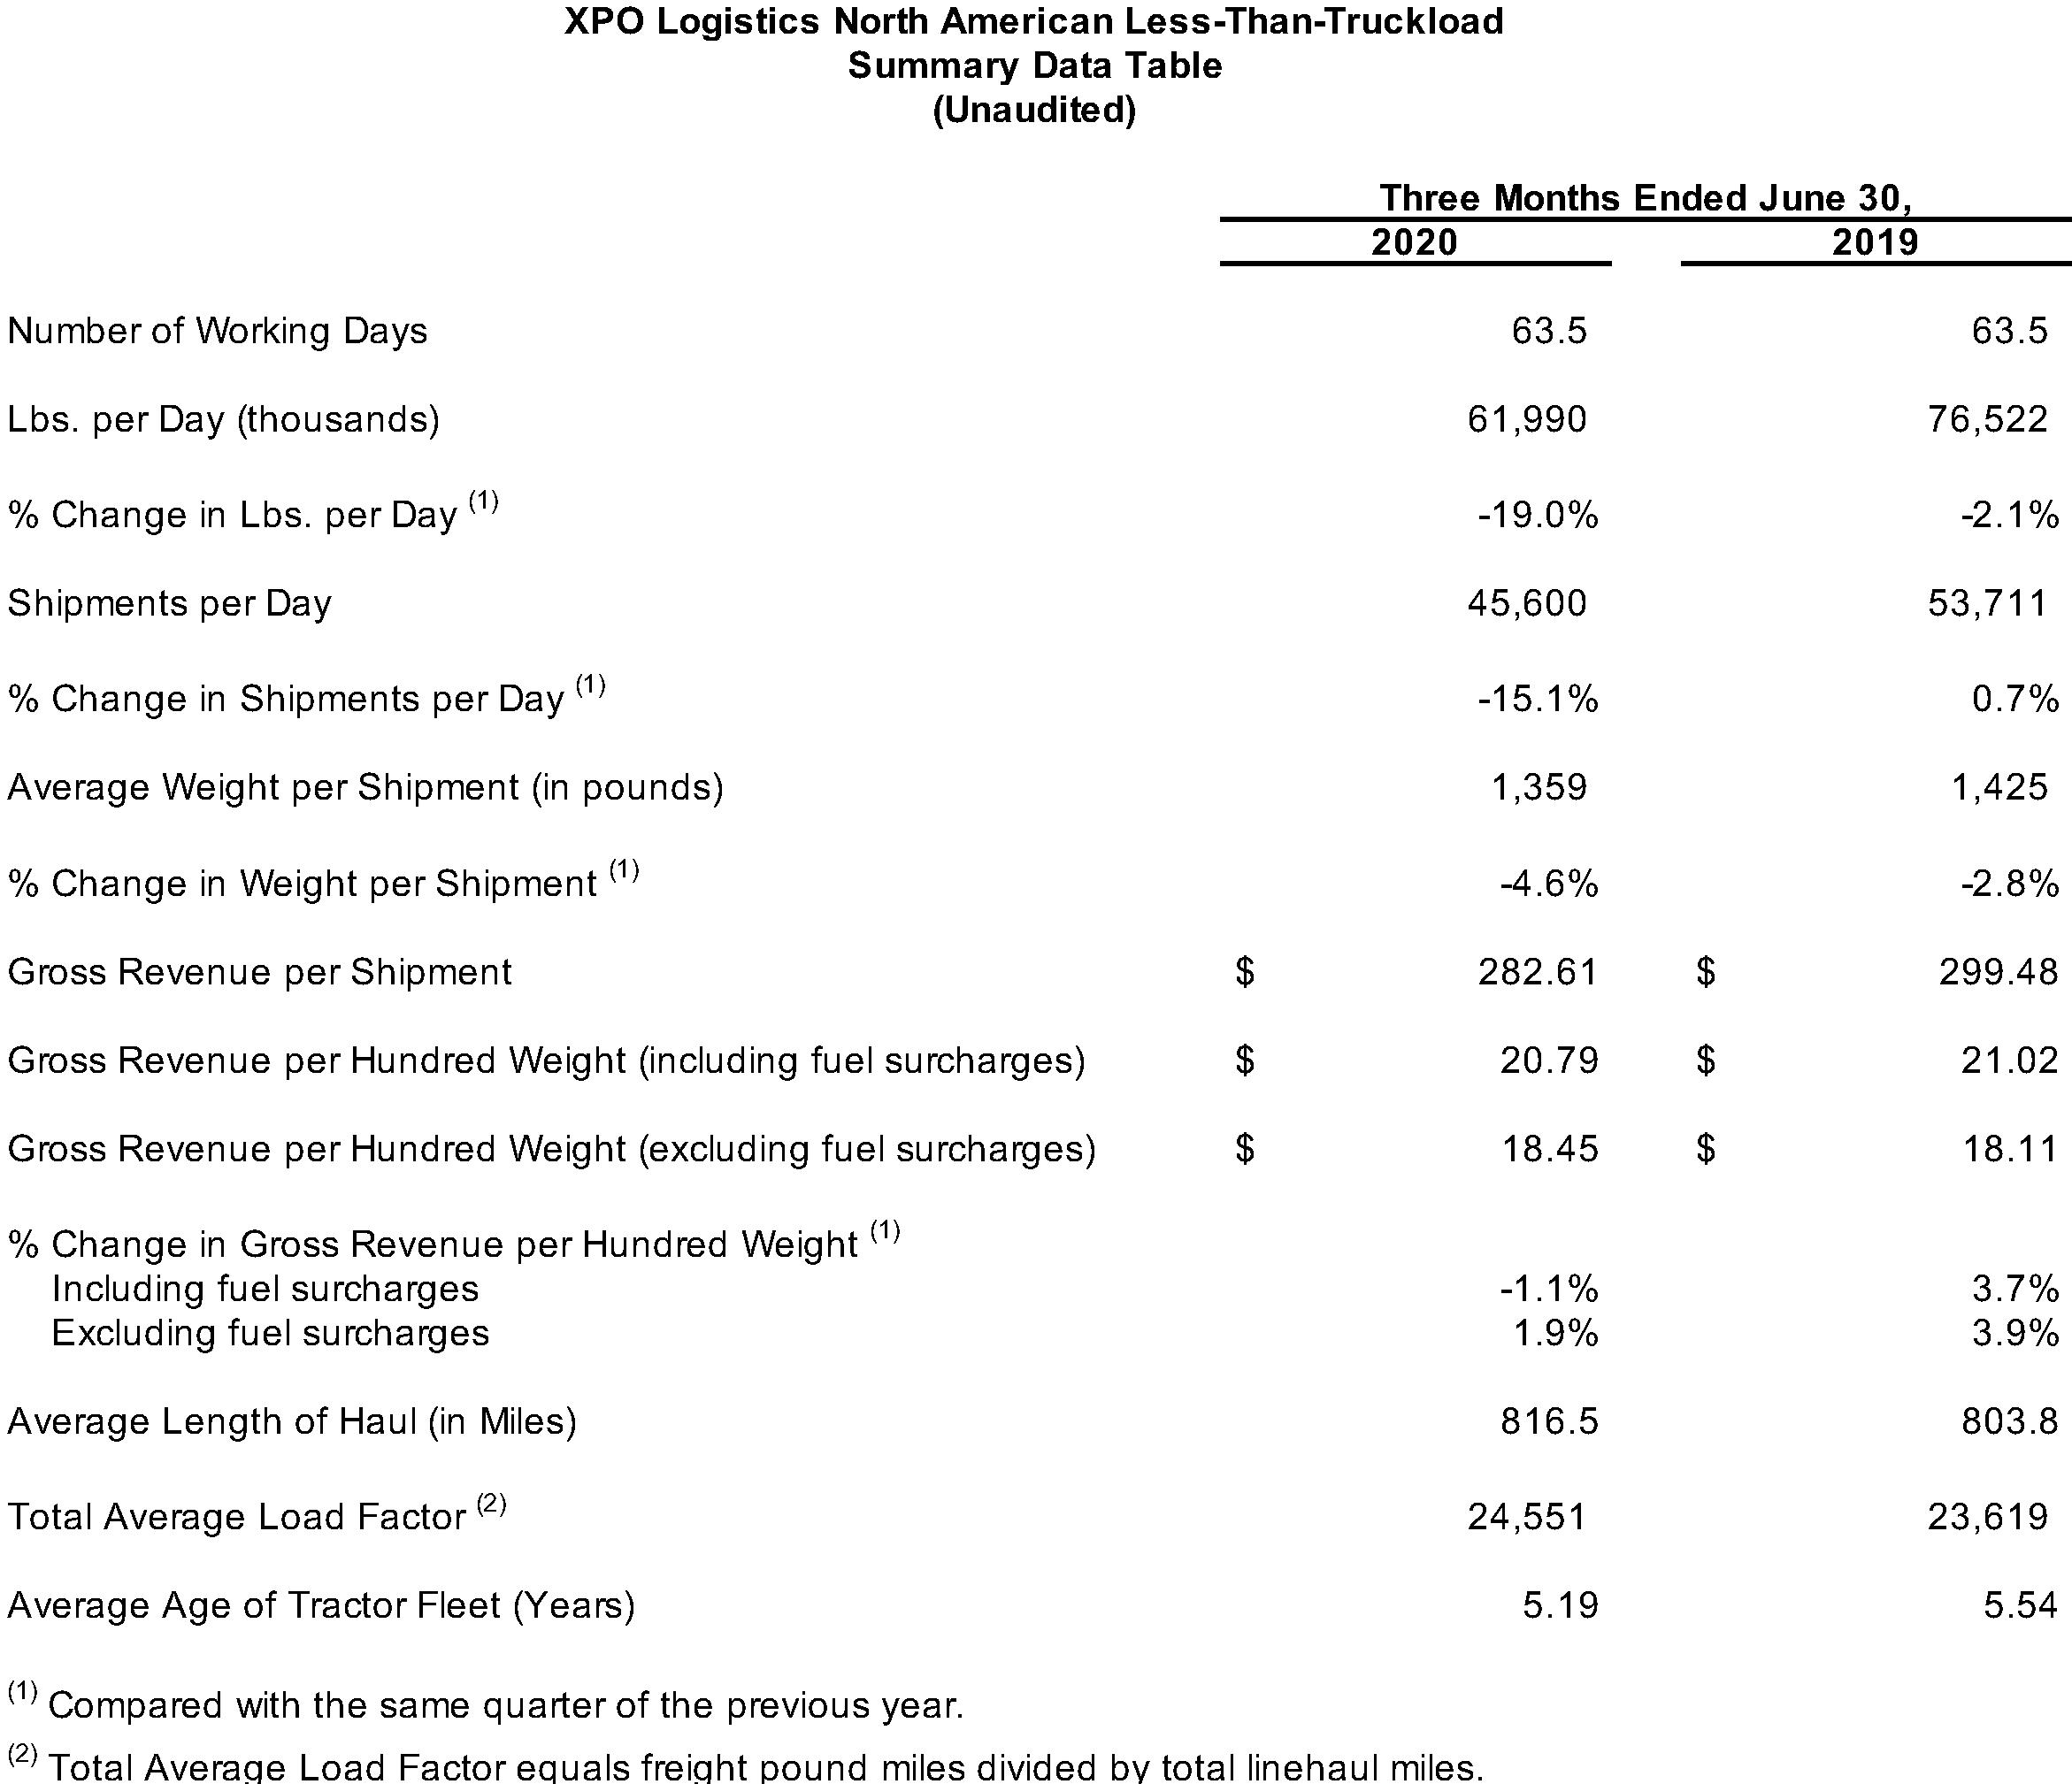 North American LTL Summary Data Table